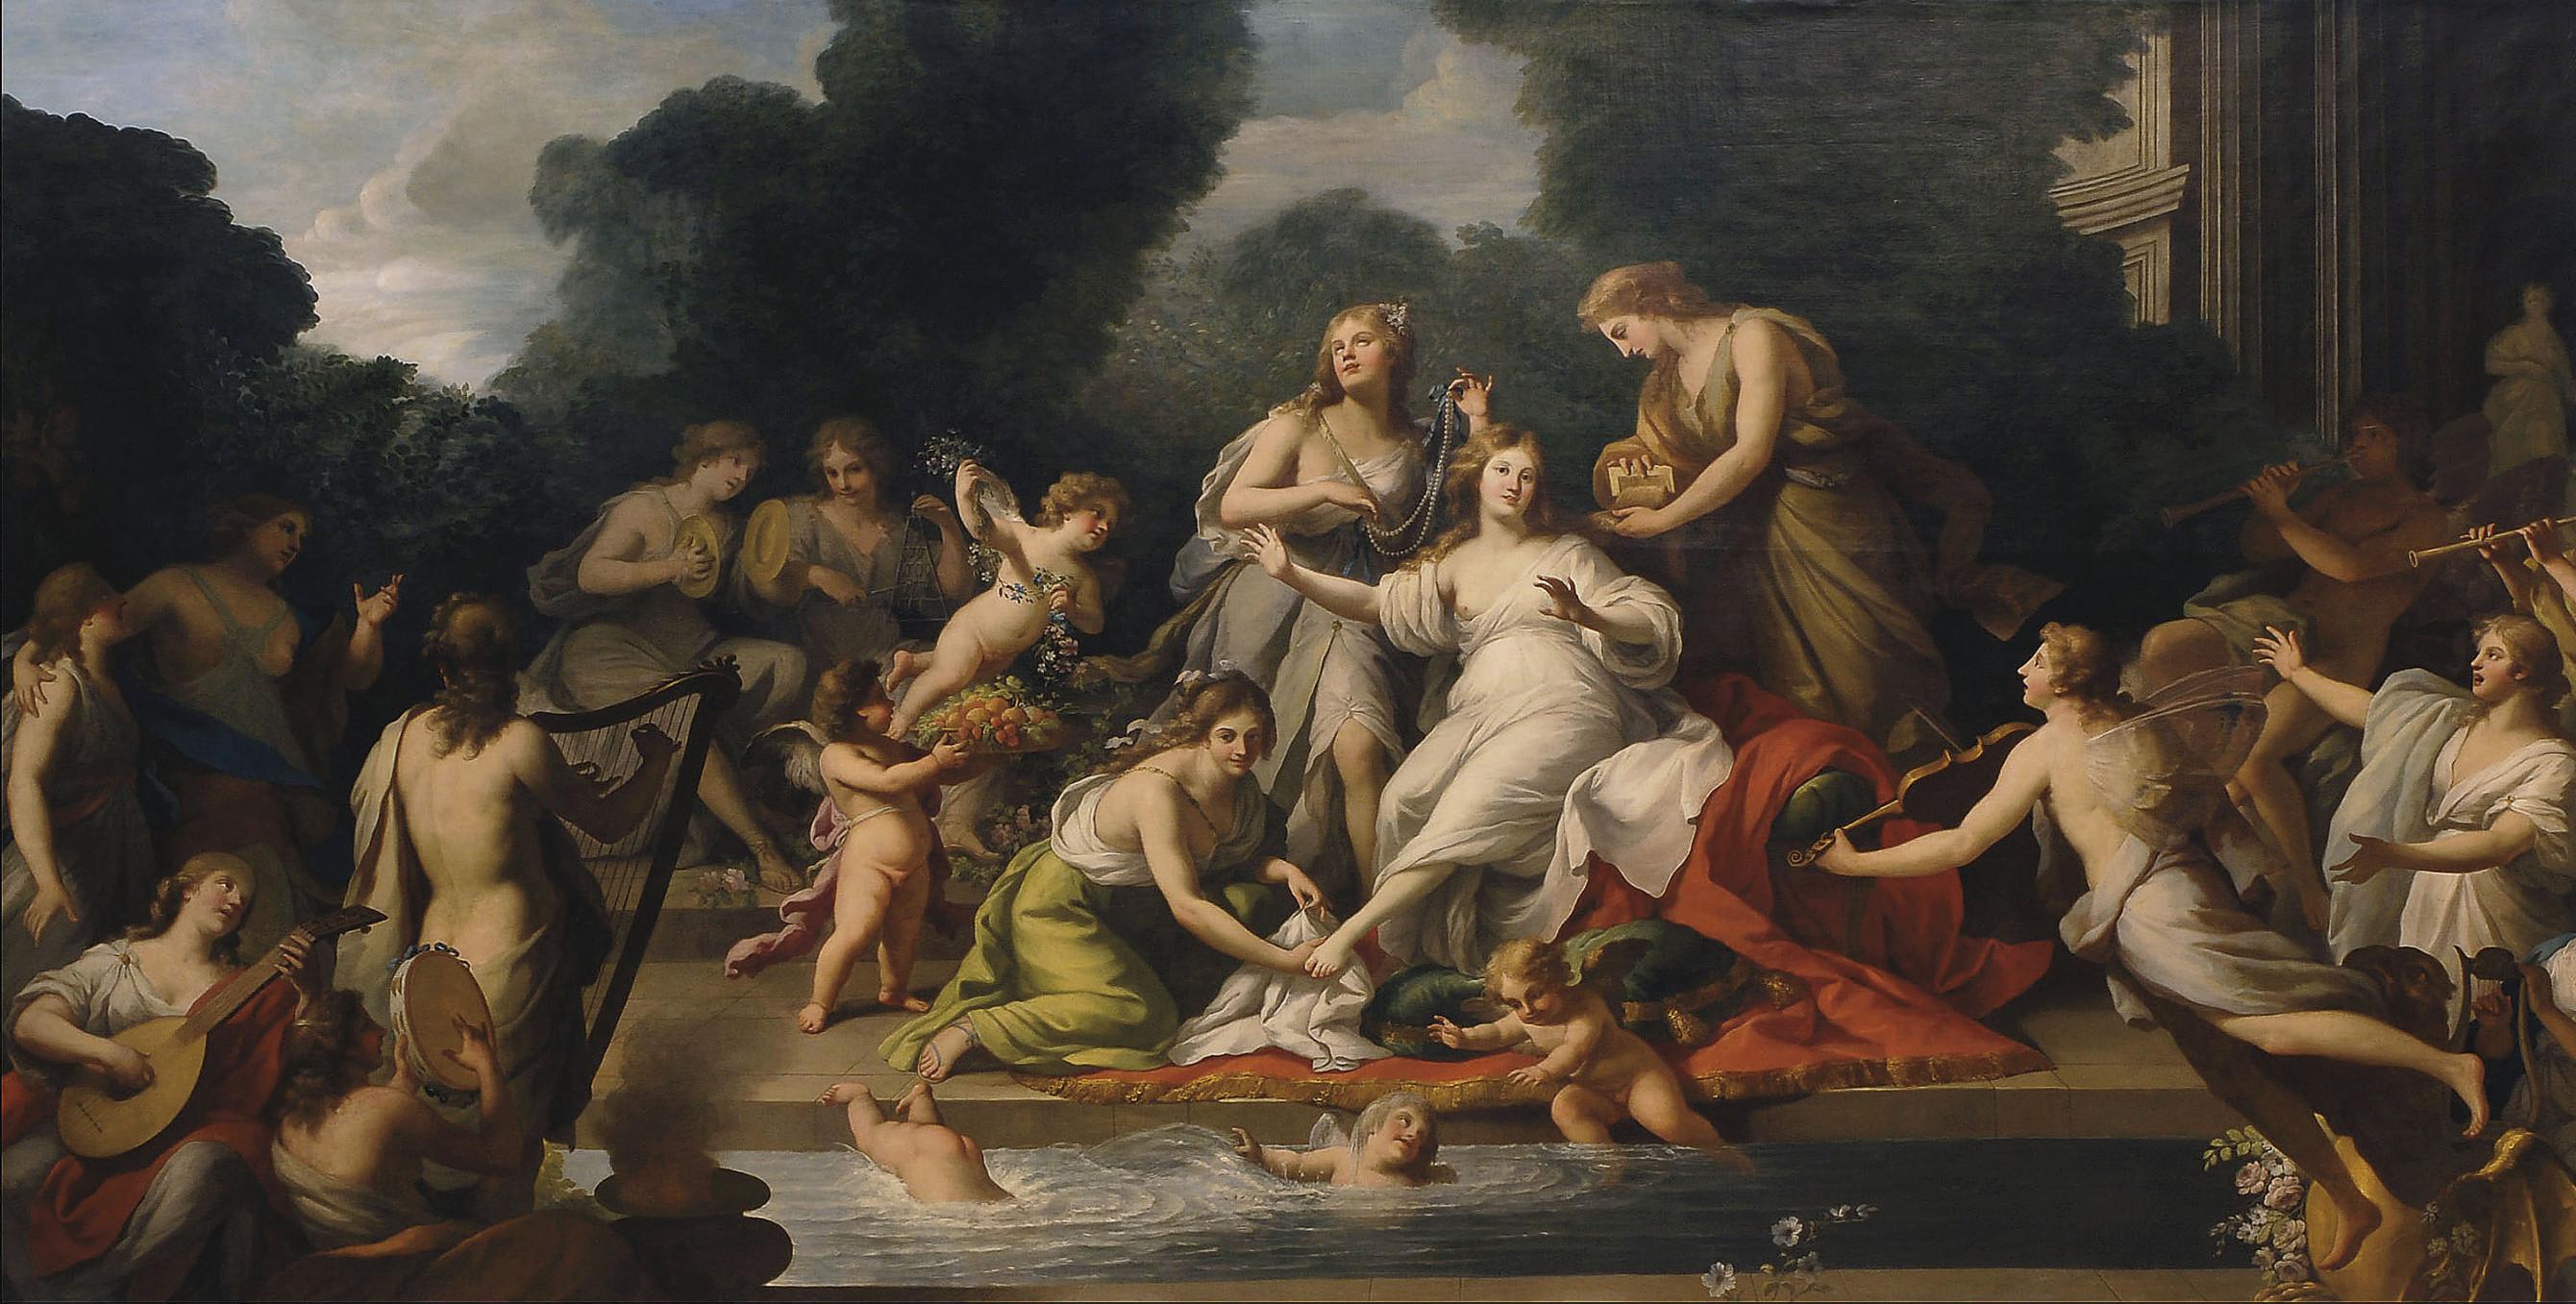 FEDELE FISCHETTI (NAPLES 1732-